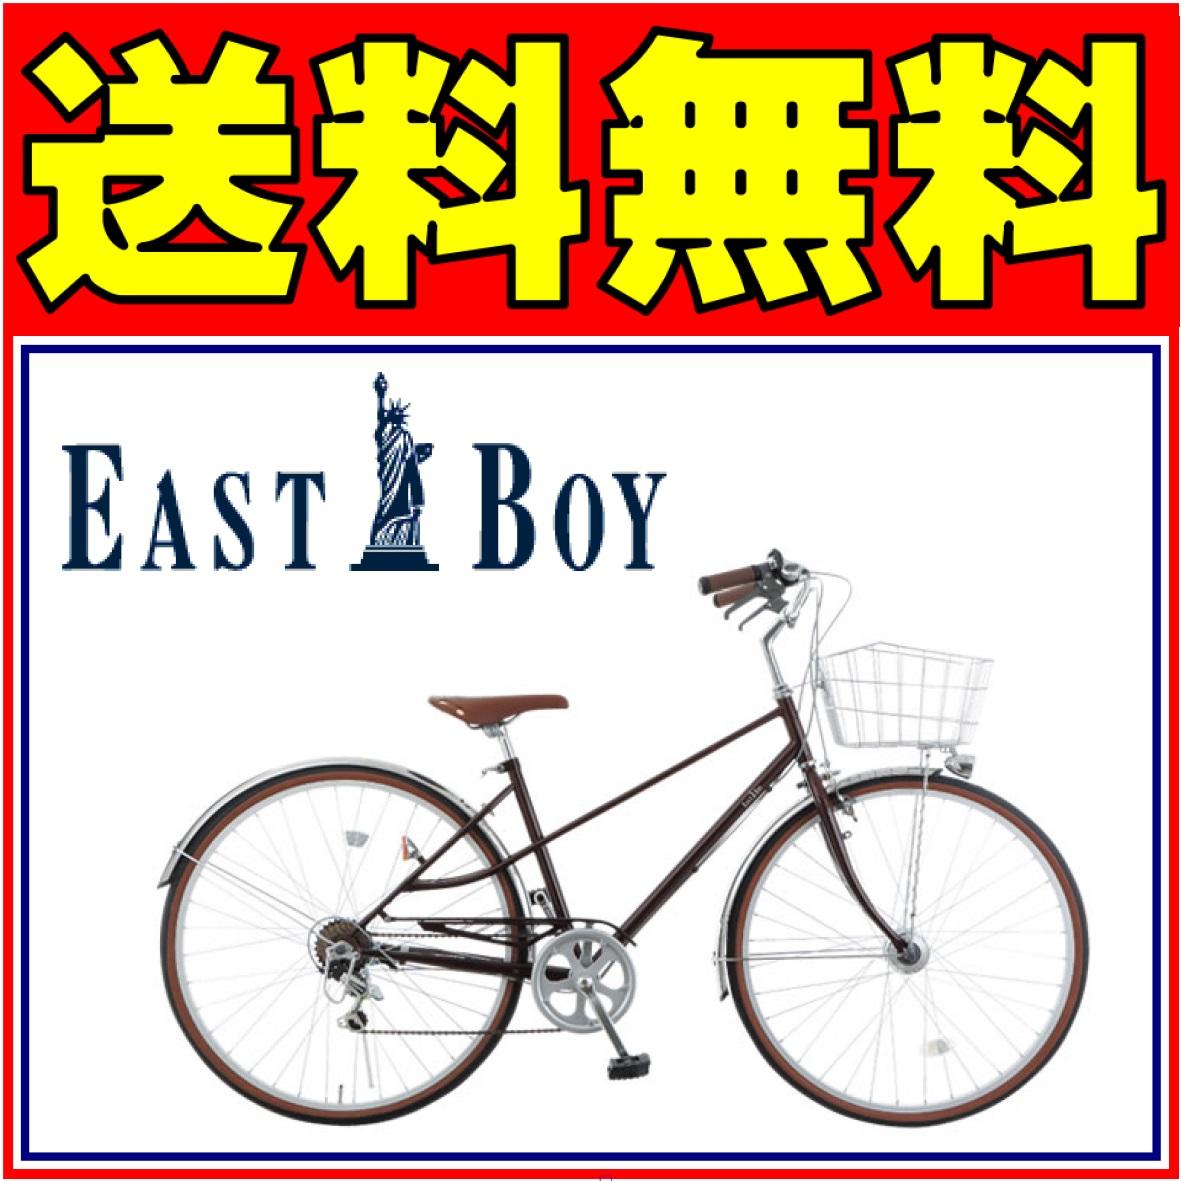 EASTBOY イーストボーイ 自転車 シティサイクル ブラウン 女子高生、女子中学生の通学に最適 クラシックスポーツ 外装6段ギア シティ車 27インチ LEDオートライト イーストボーイ 自転車